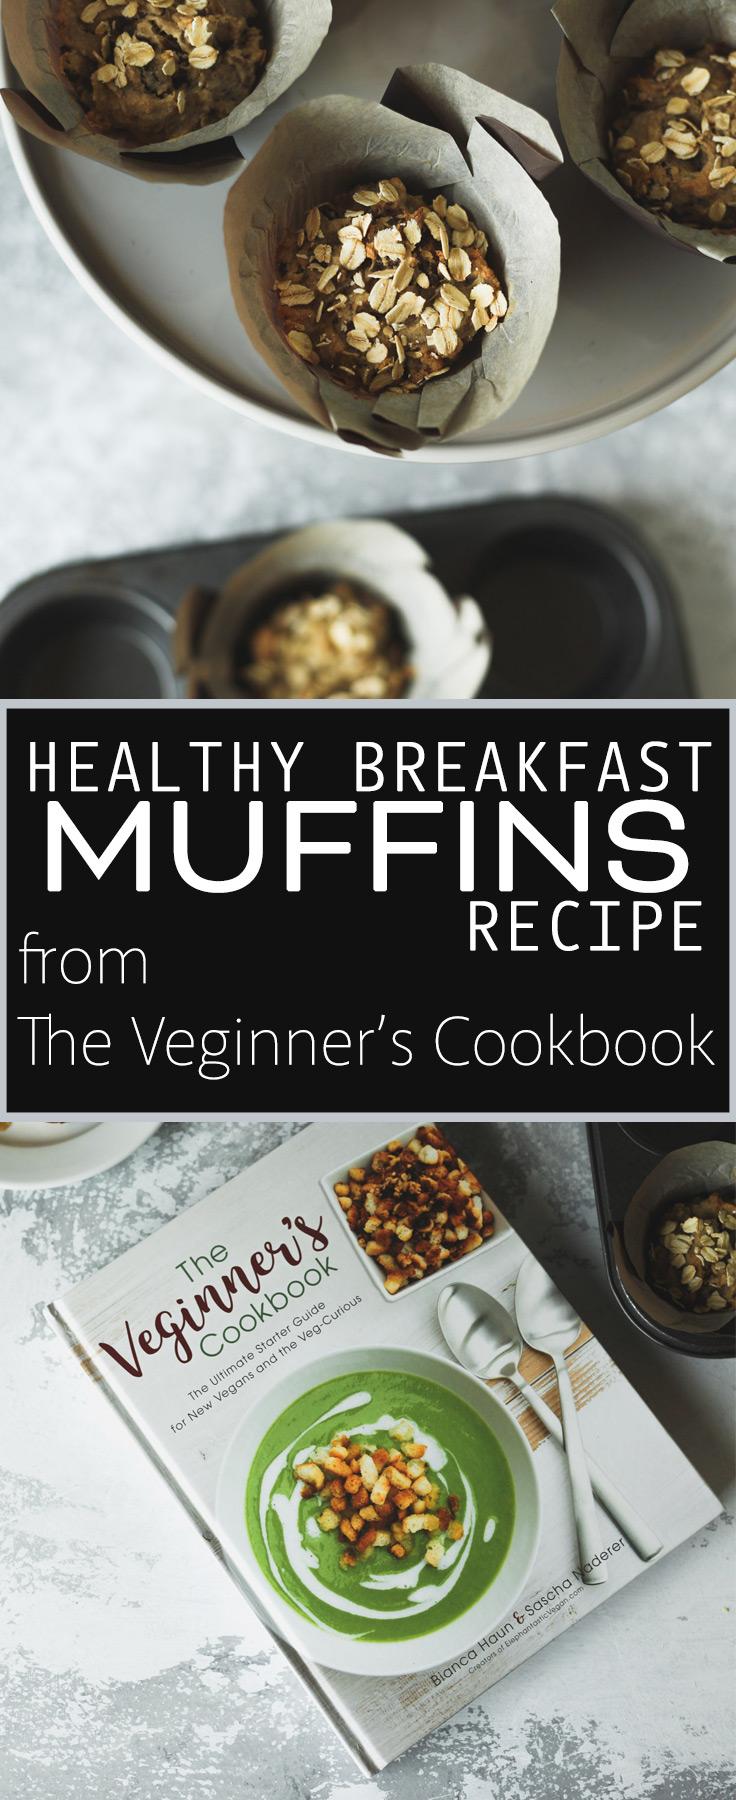 Healthy Breakfast Muffins from The Veginner's Cookbook by Bianca Haun & Sascha Naderer. Photos by Kari of Beautiful Ingredient. Vegan